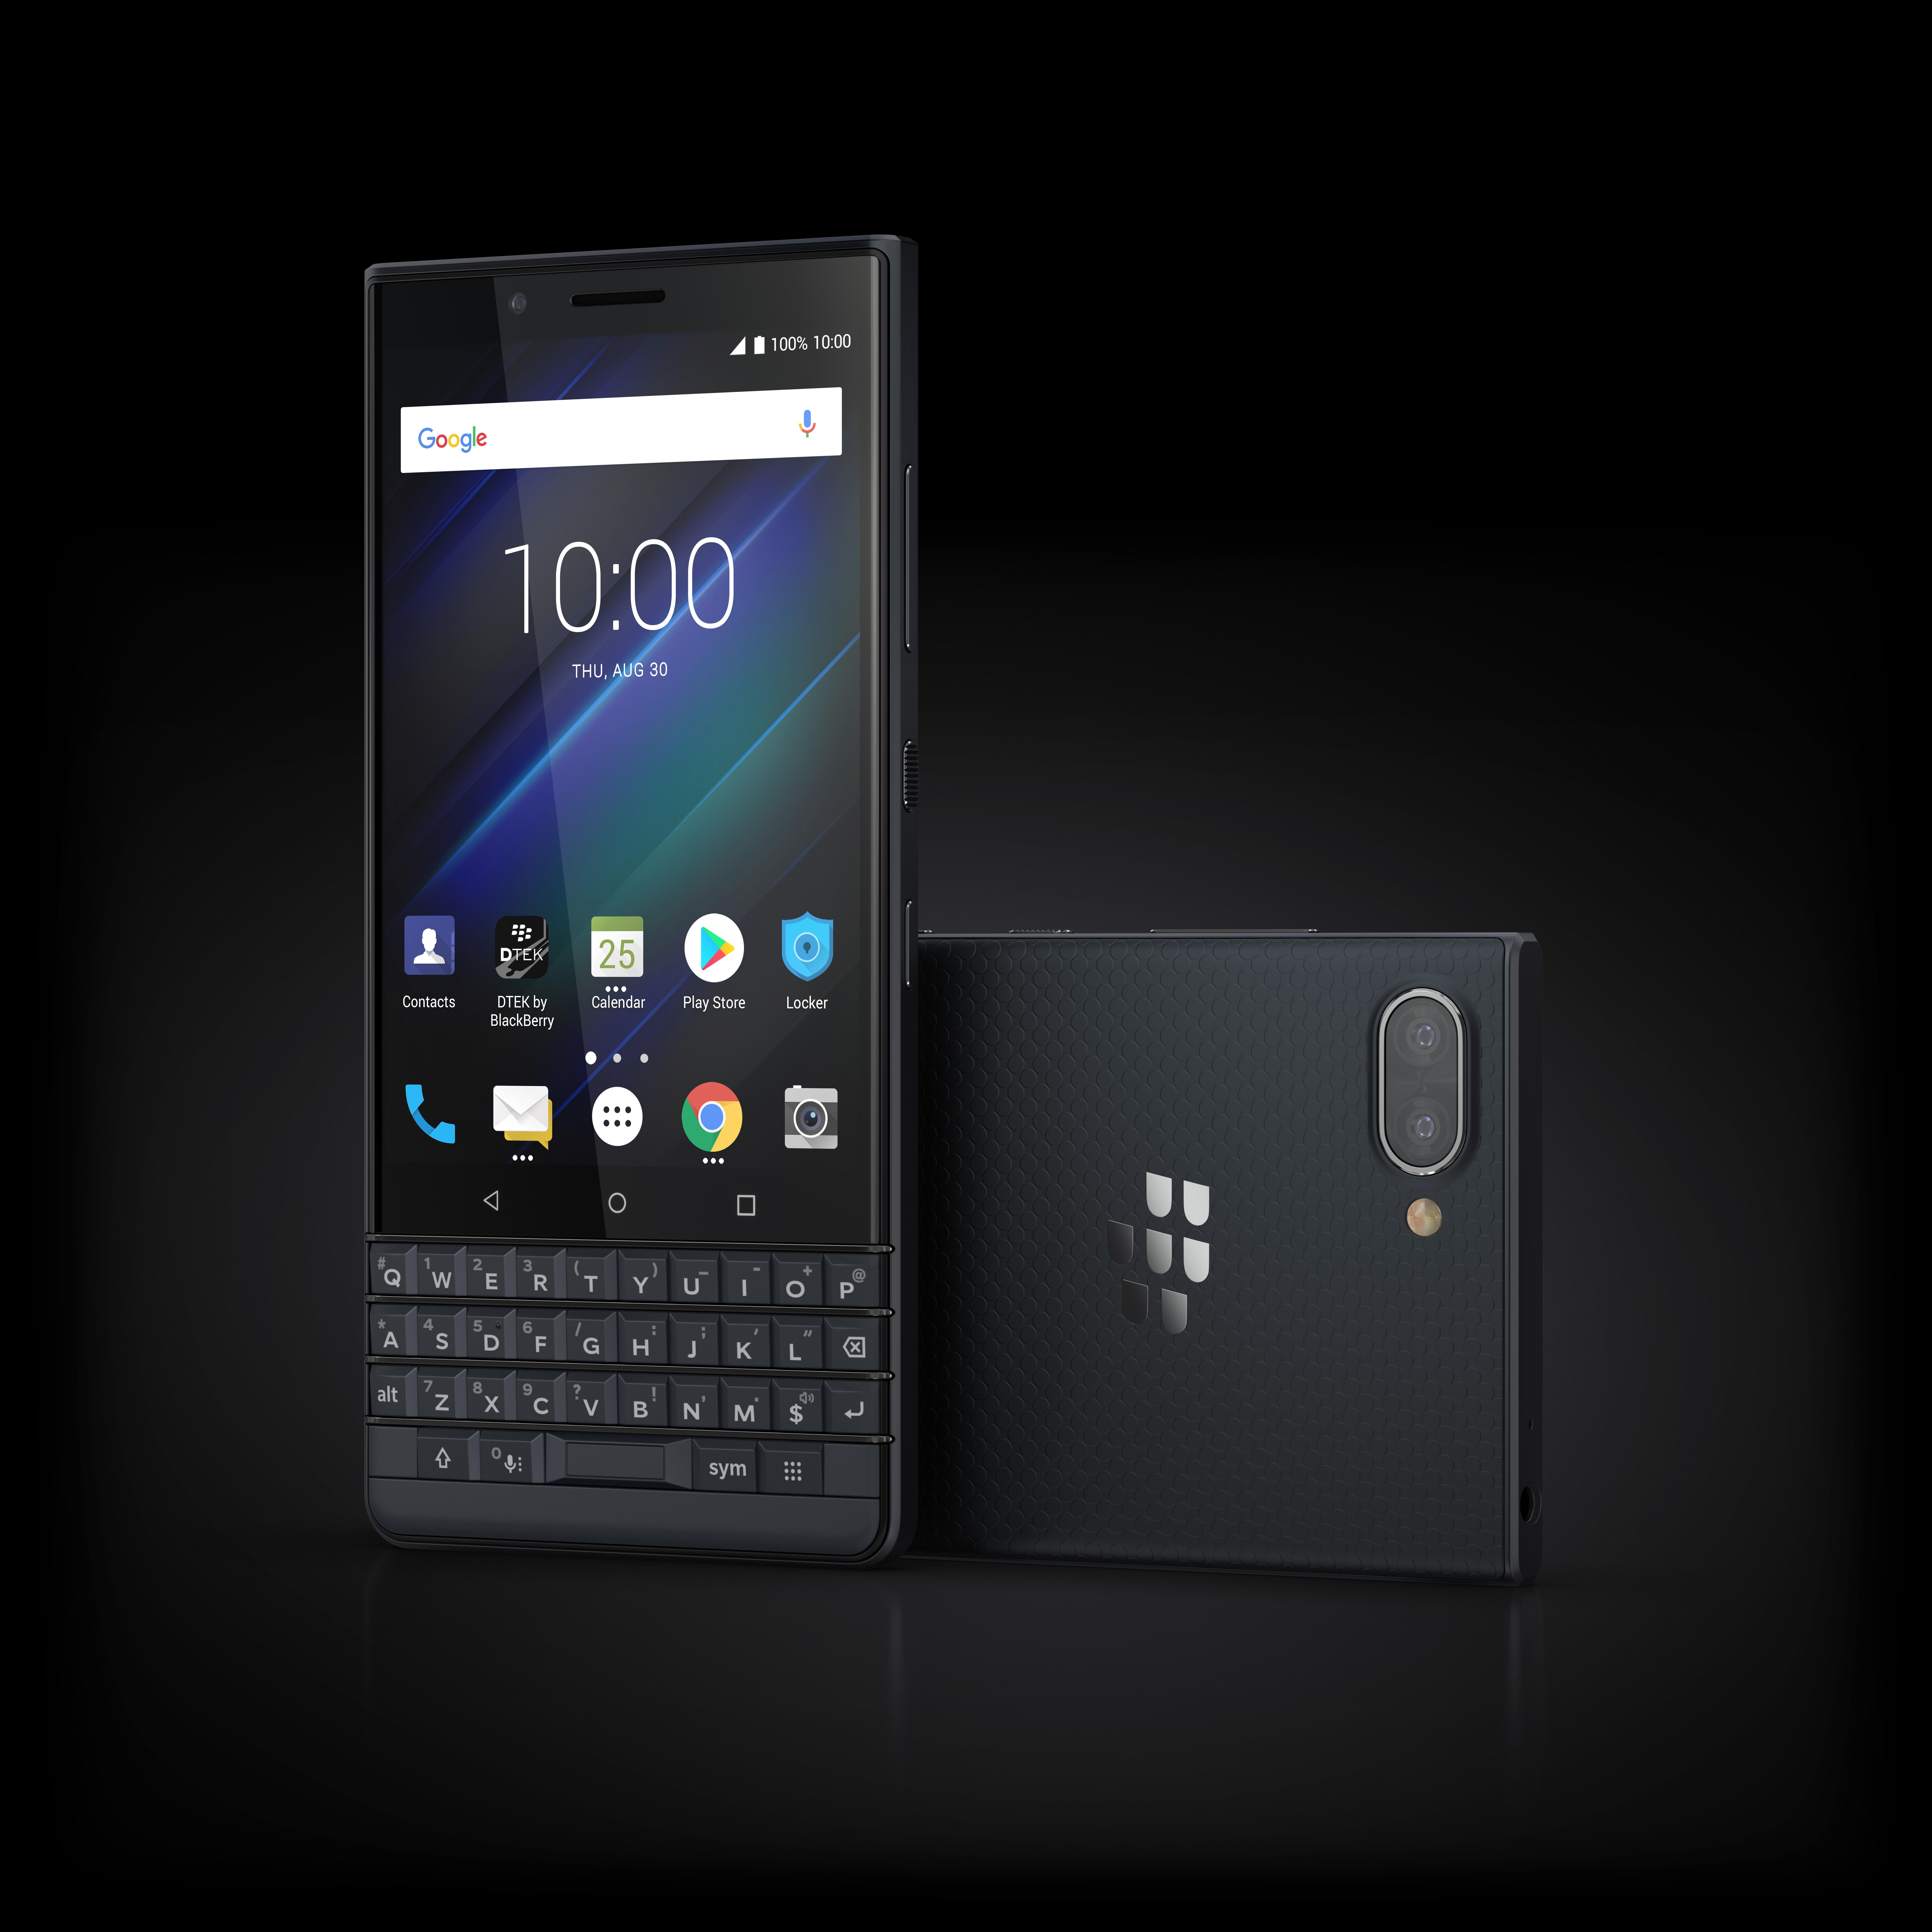 10 Luna Slate Stylized - BlackBerry KEY2 LE